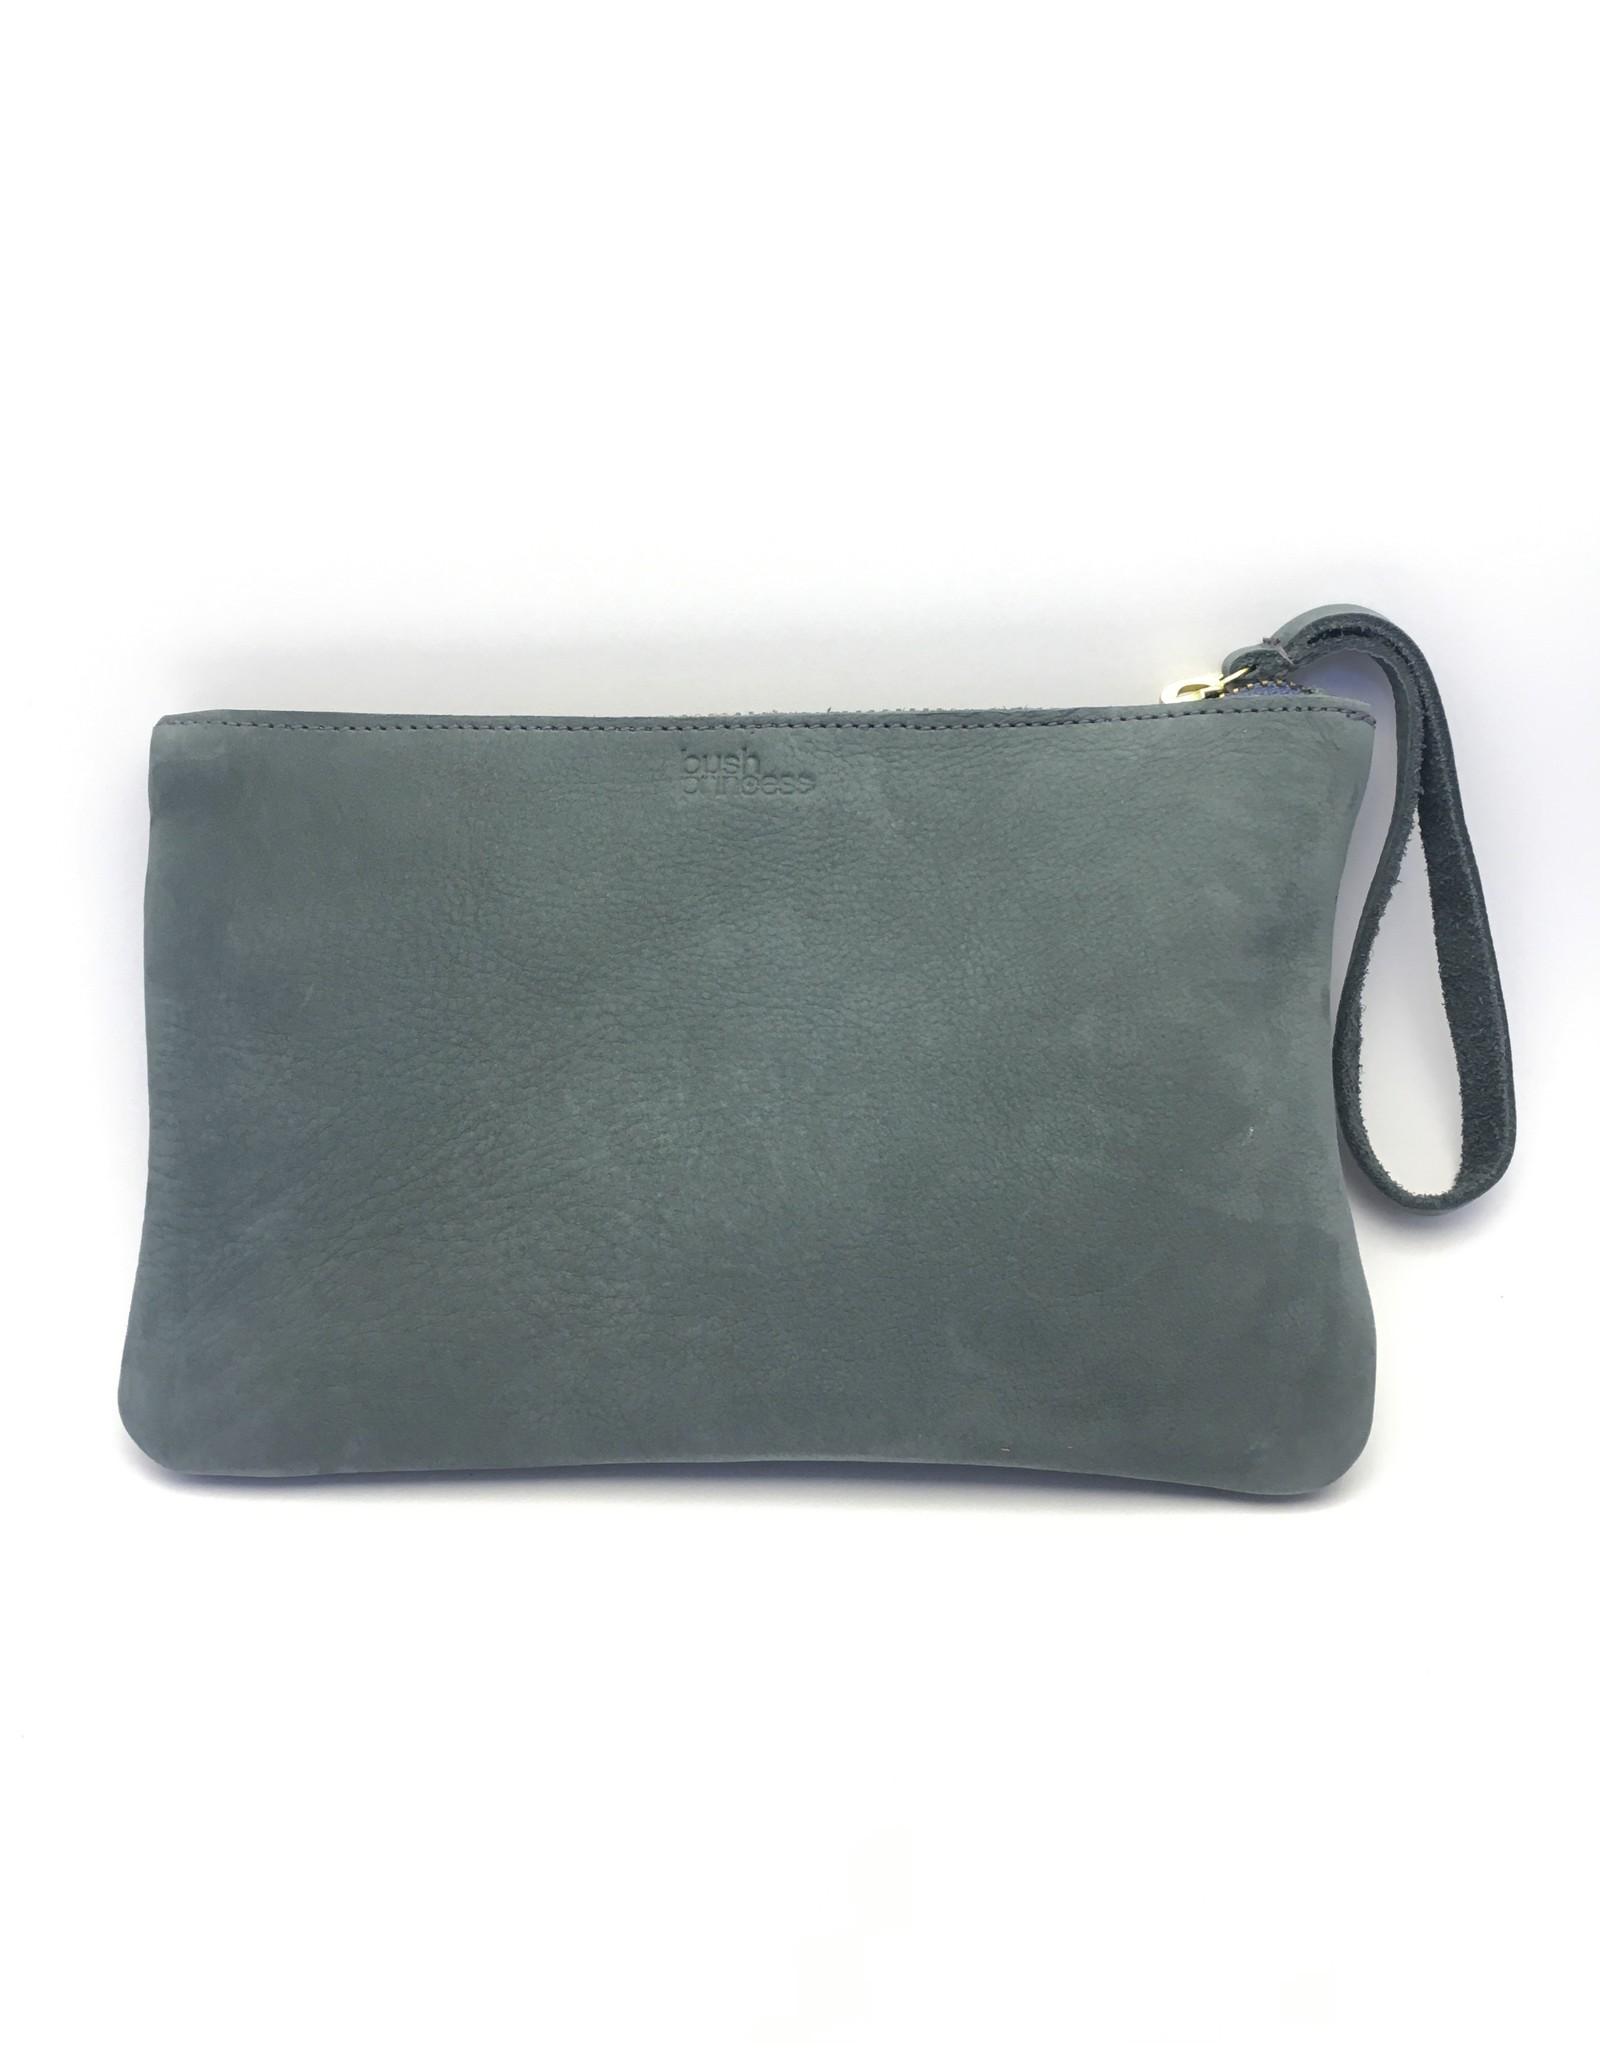 Maisha.Style Laikia purse - mouse grey suede purse with disc of tone on tone beads